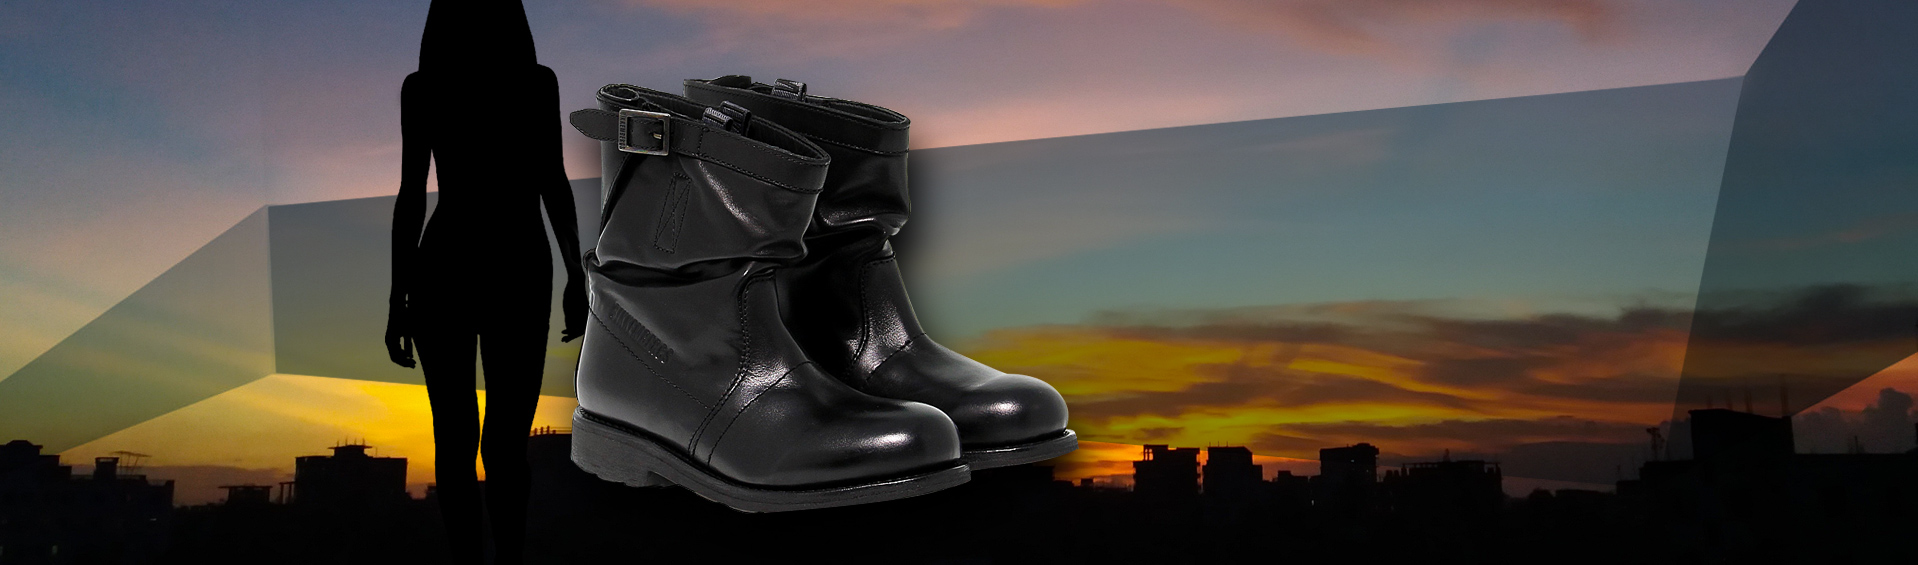 scarpe-Bikkenbergs-scarpelli-calzature-prato